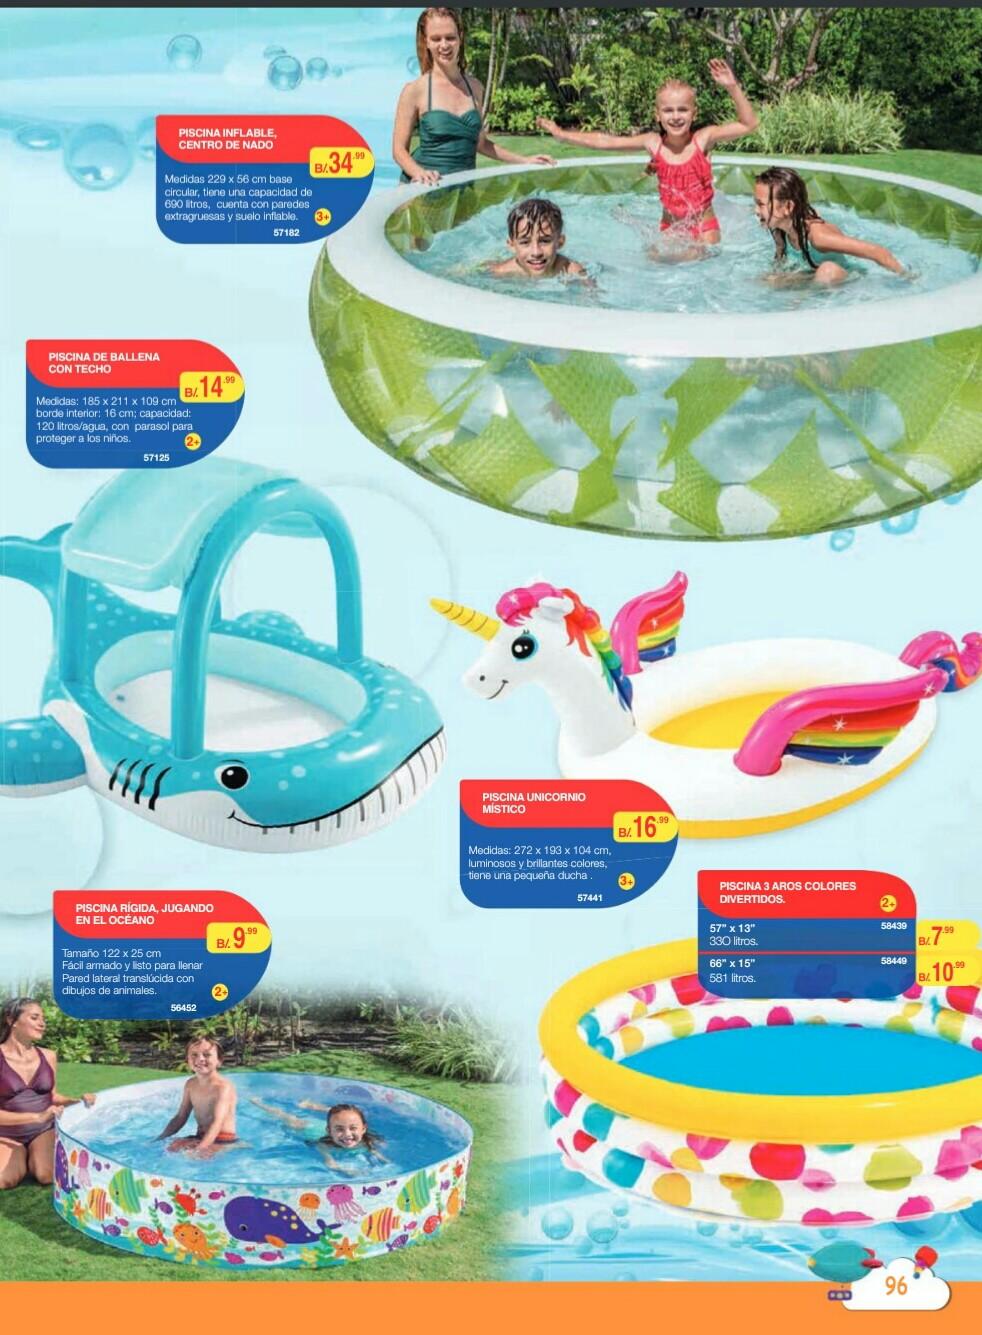 Catalogo juguetes Titan Toys 2018 p98